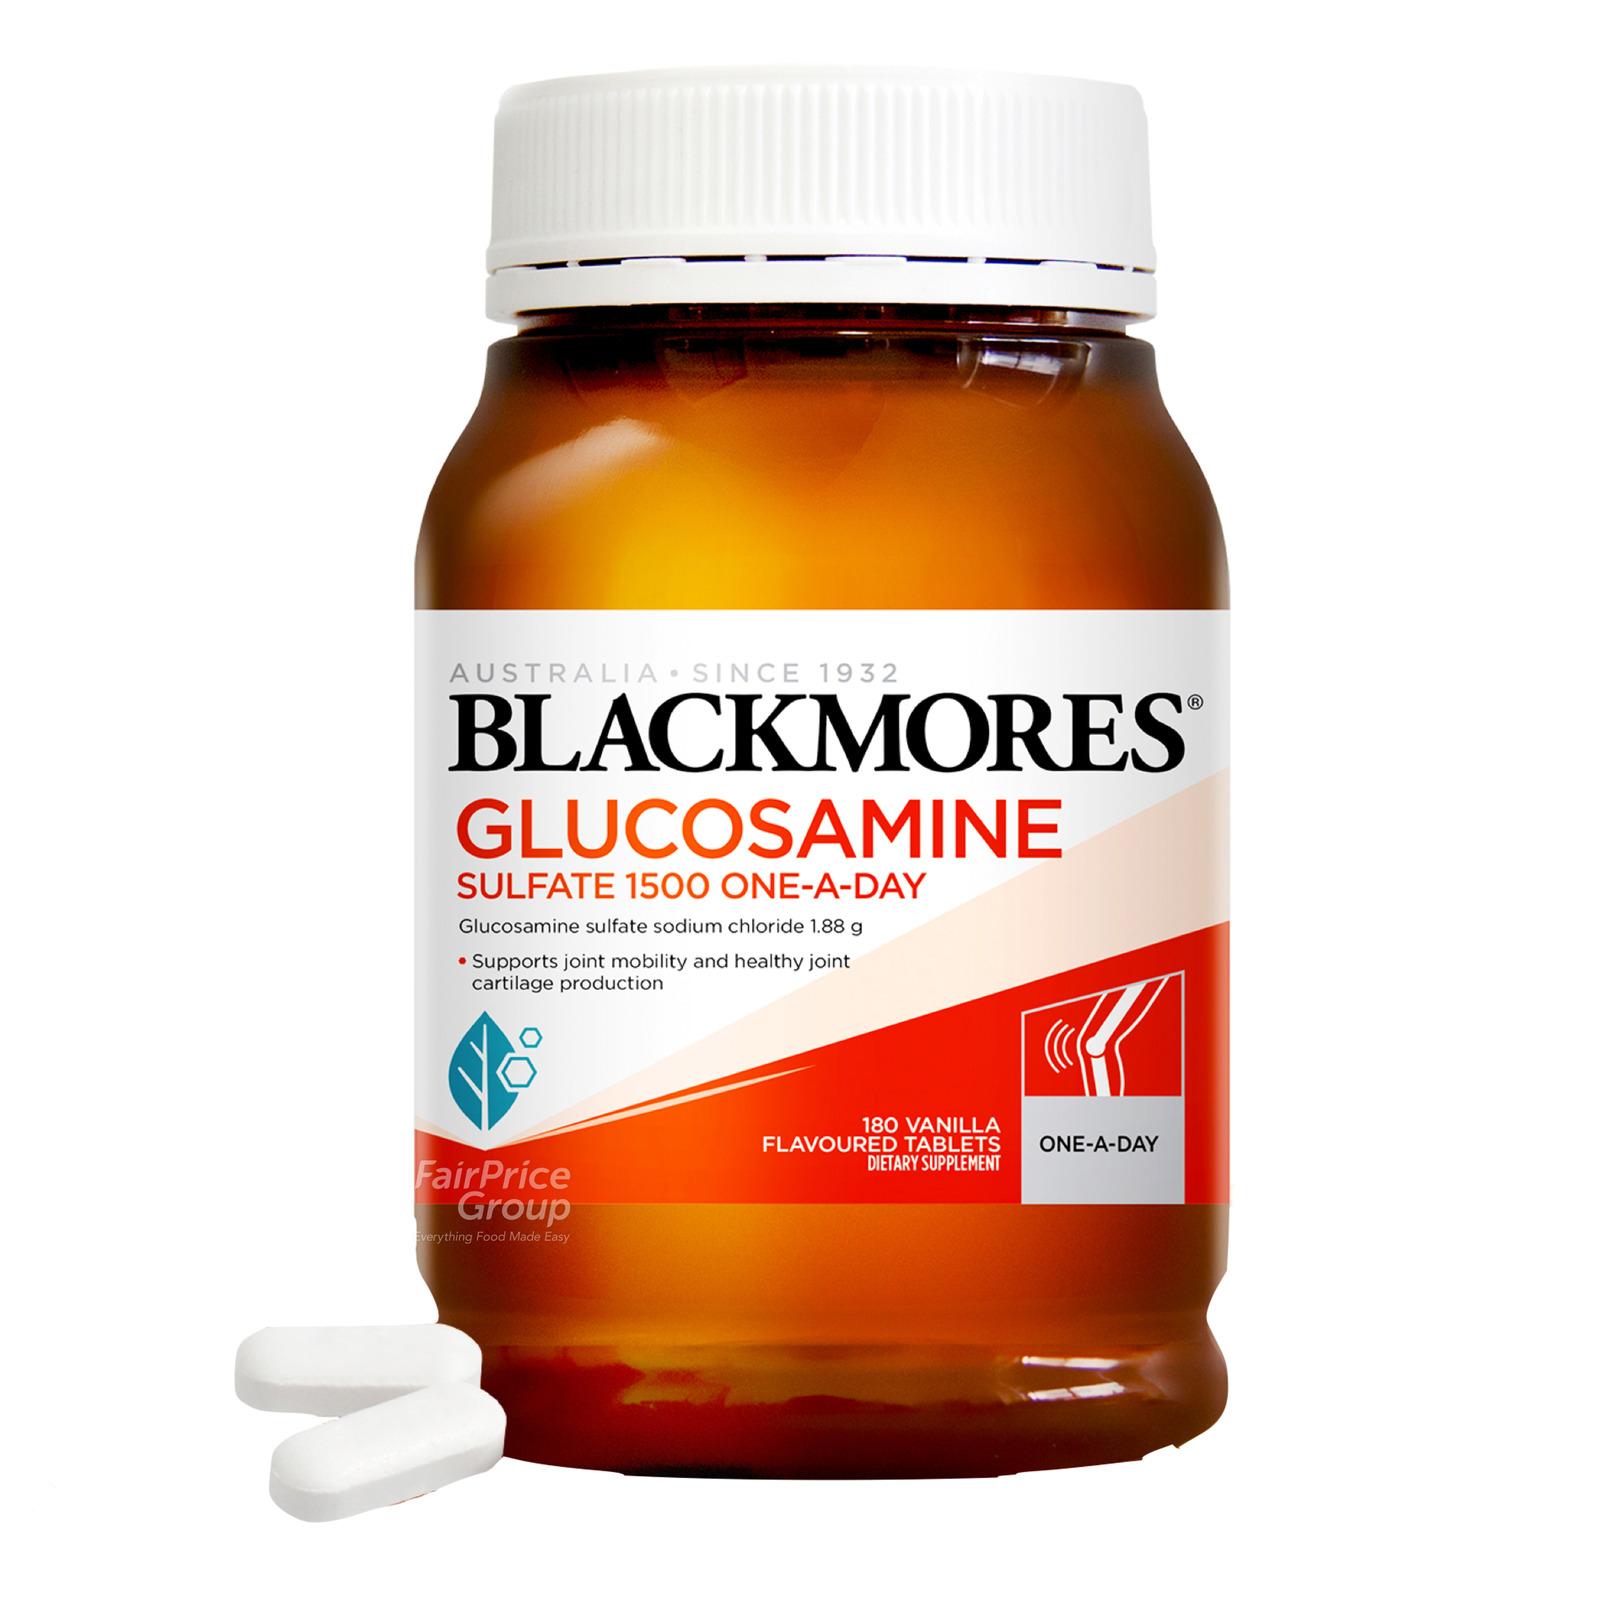 Blackmores Health Supplement - Glucosamine 1500